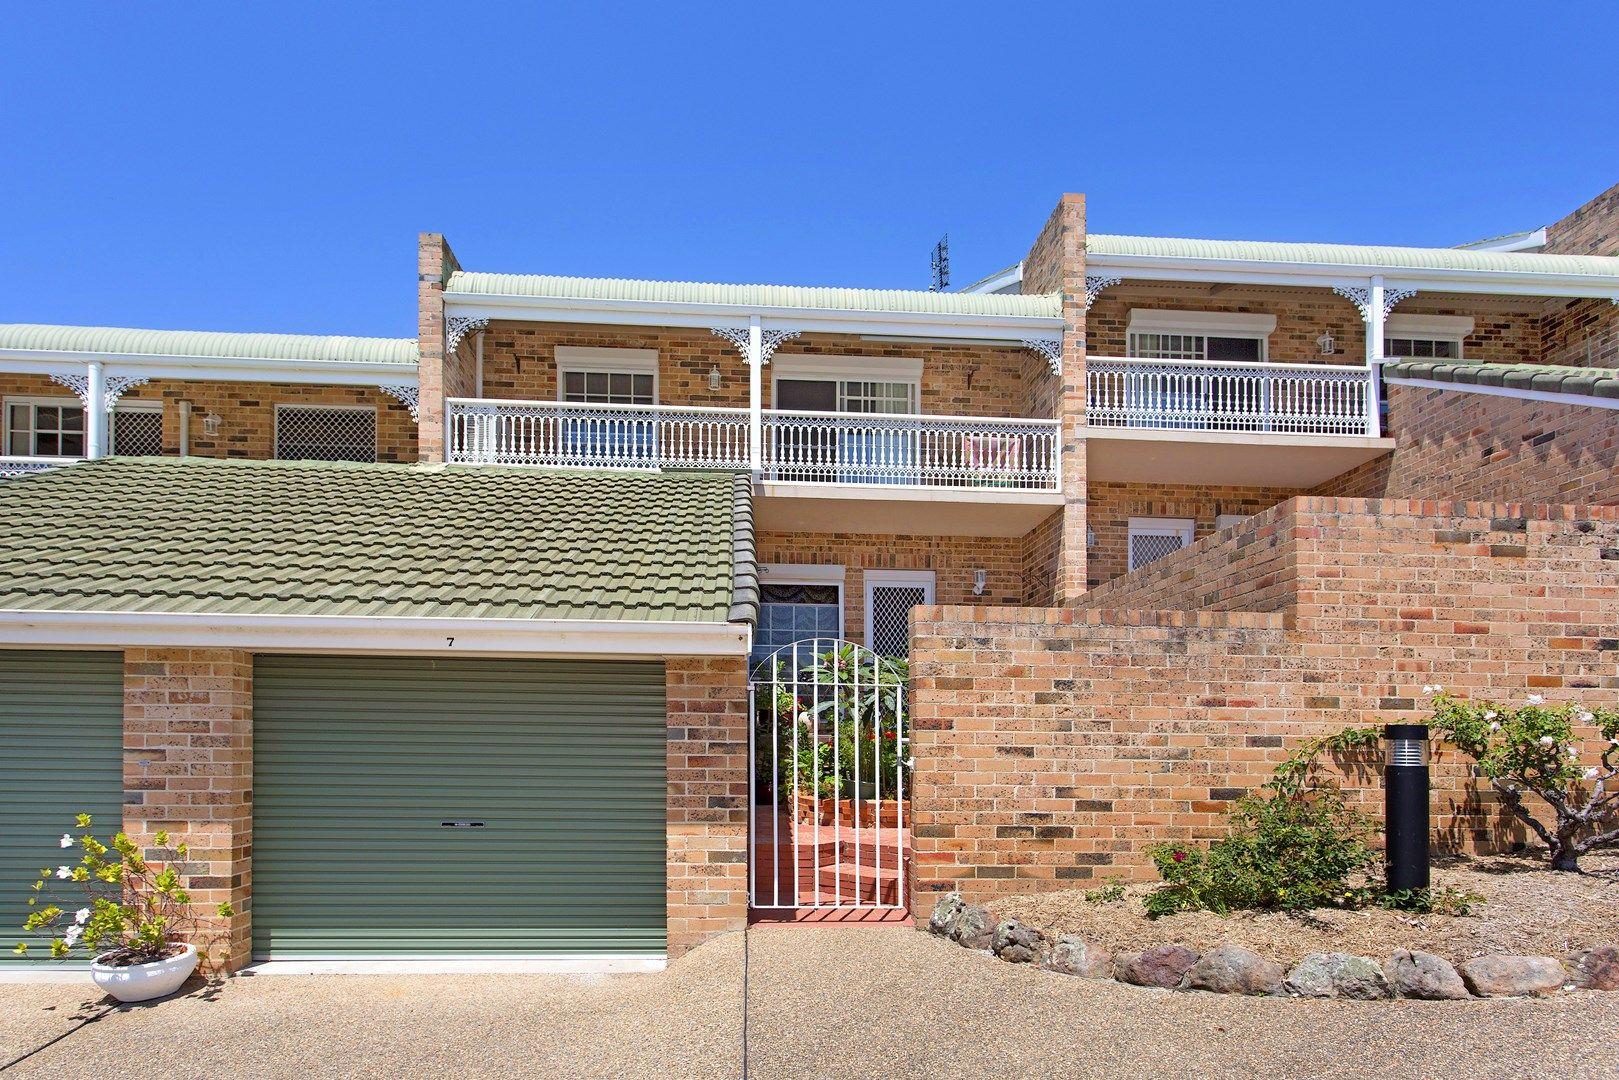 7/144 Terralong Street, Kiama NSW 2533, Image 0